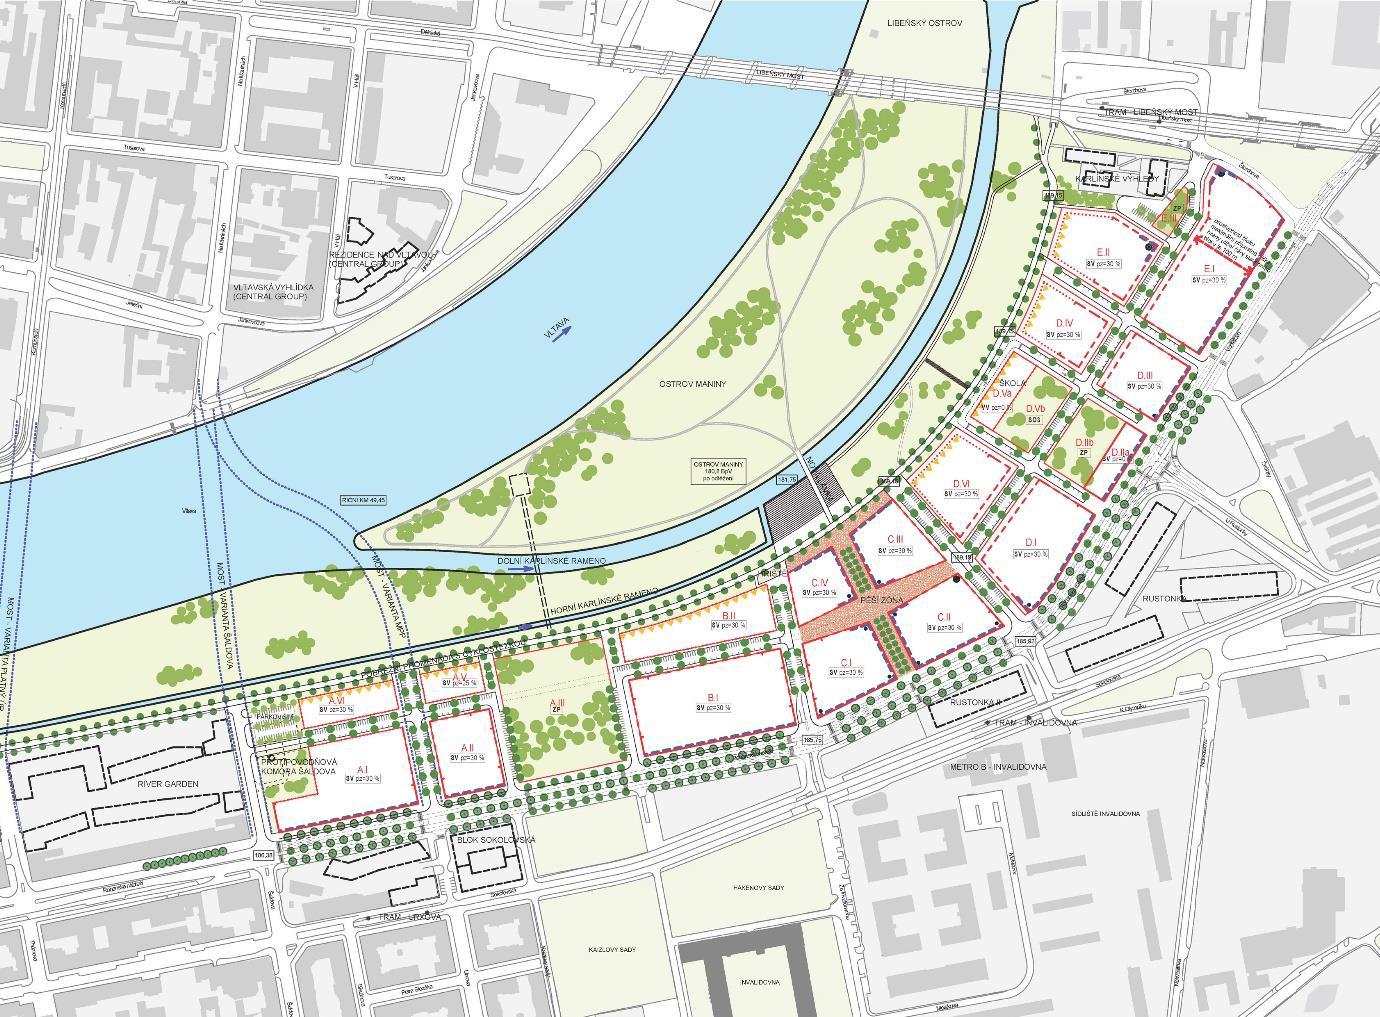 Studie s regulačními prvky Rohan City, autor Pavel Hnilička